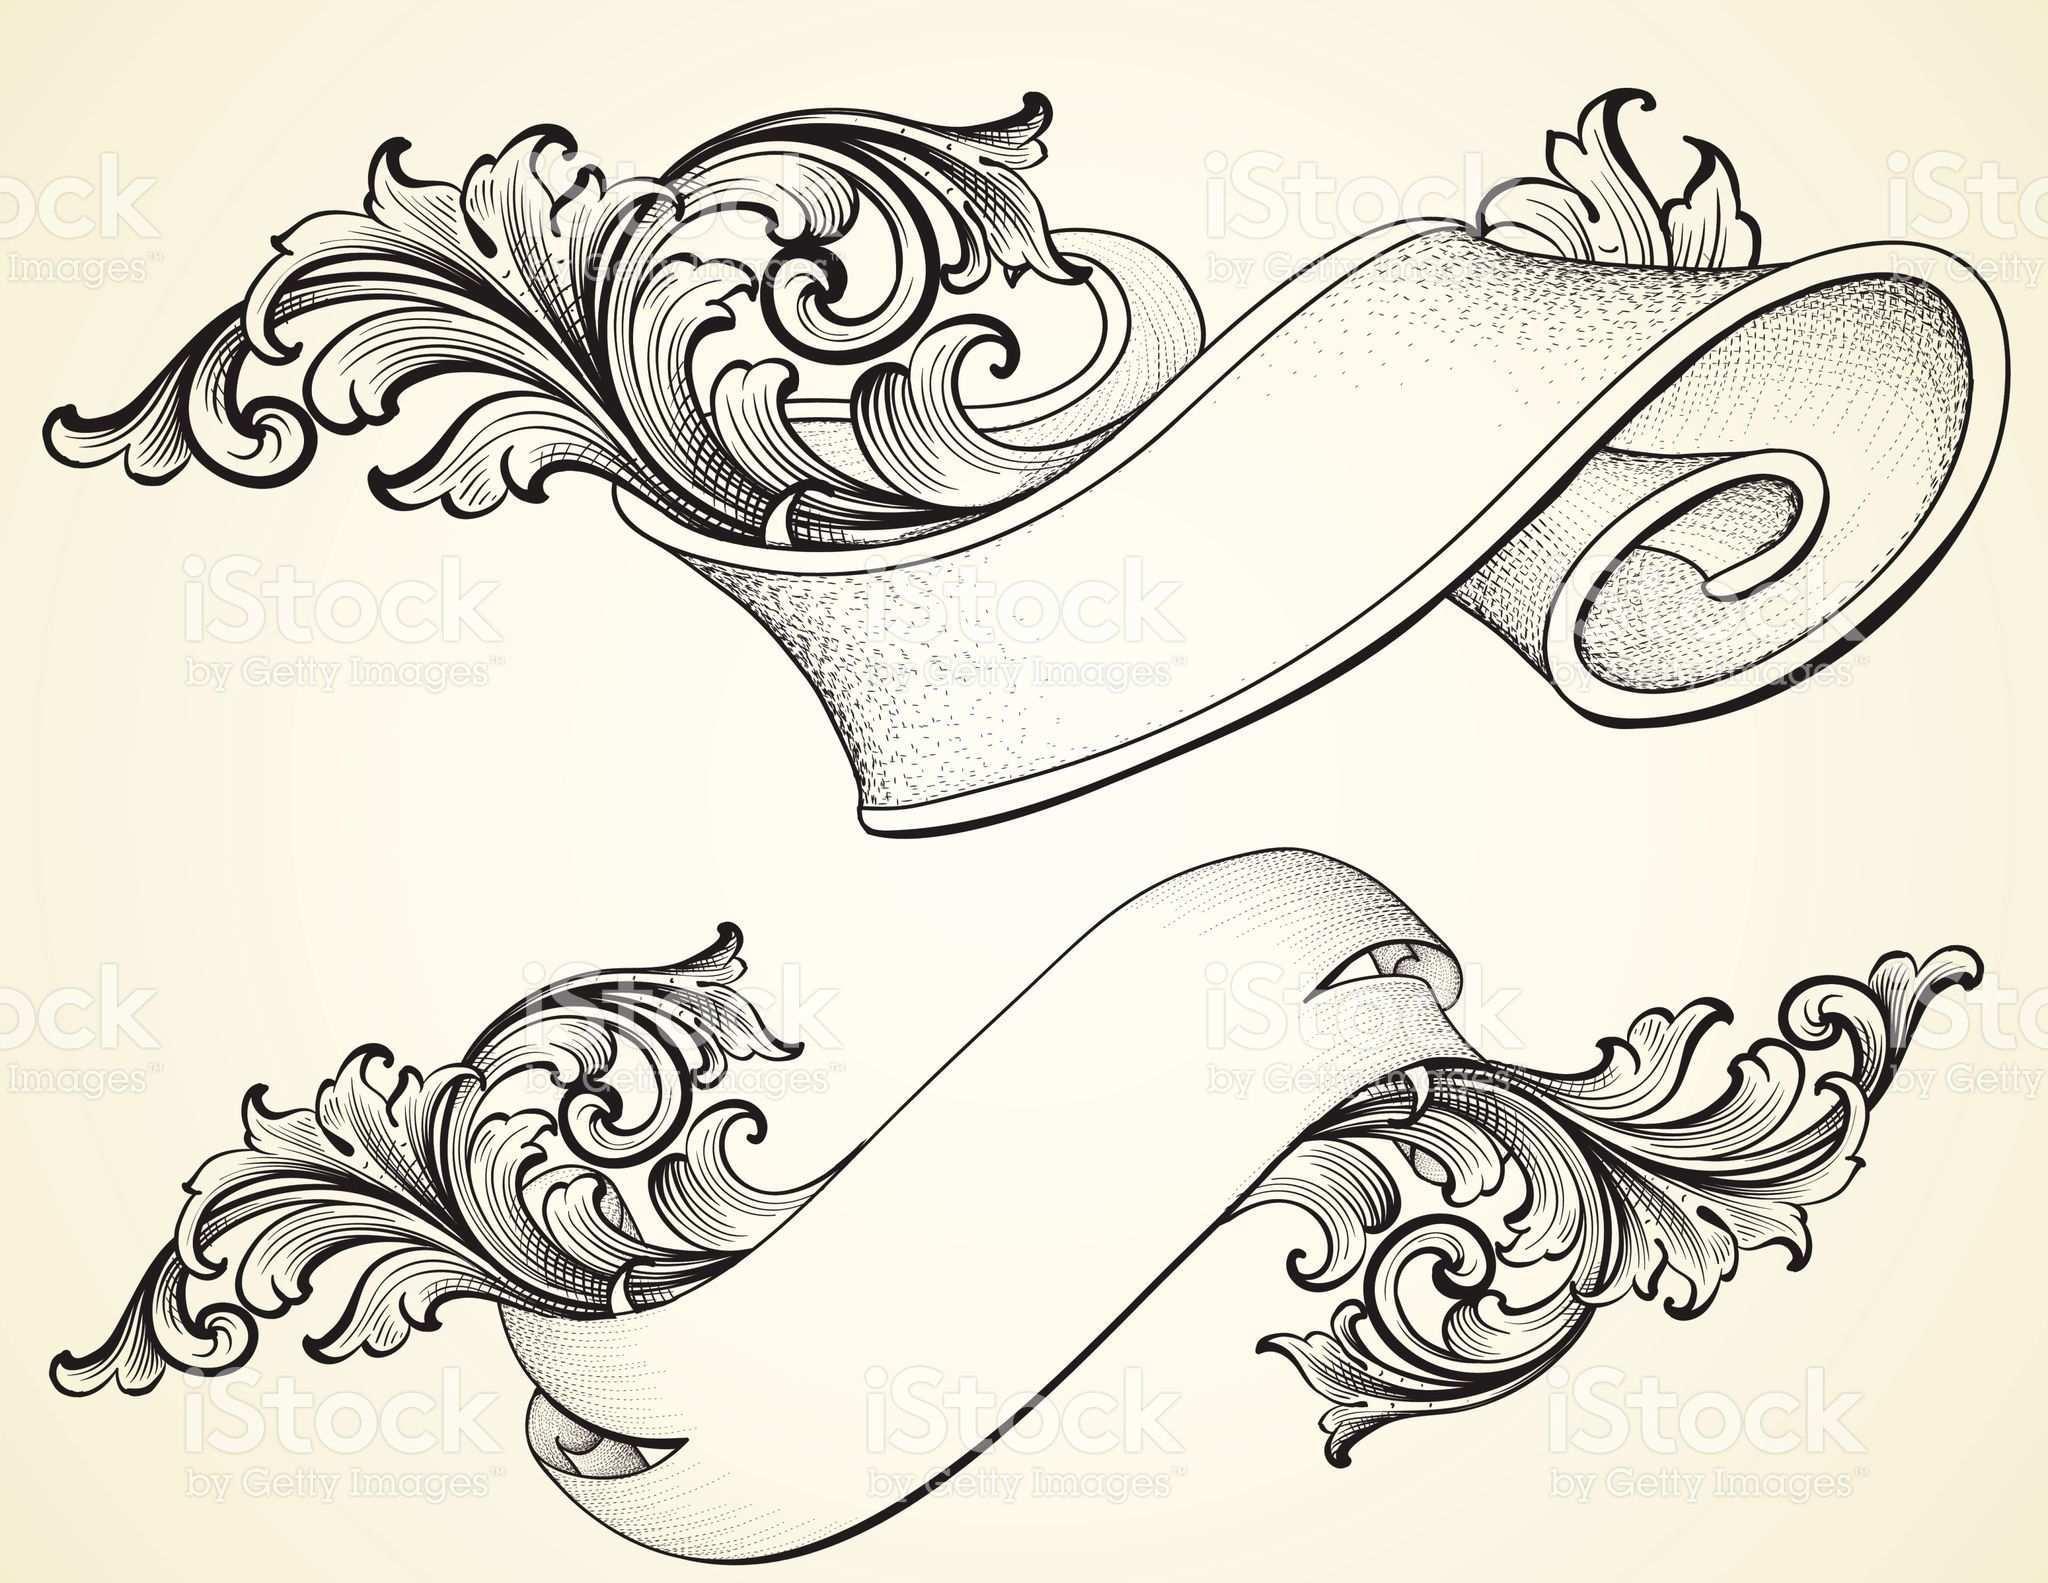 Designed By A Hand Engraver Highly Detailed Engraving Design Of A Kunstproduktion Malerei Schrift Tattoos